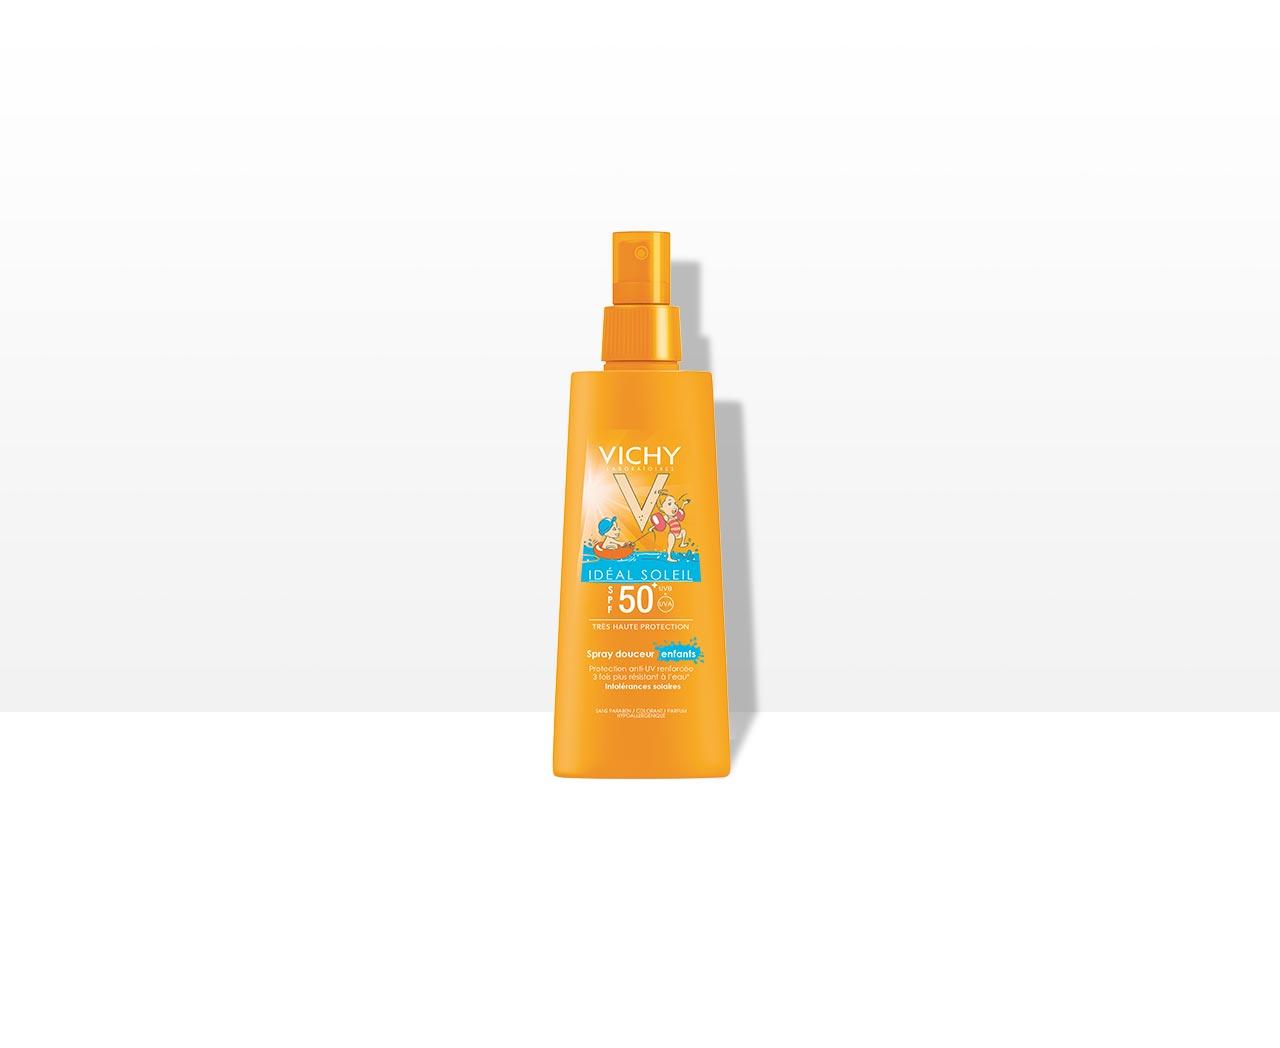 Zonnebrand spray kind SPF 50+ Ideal Soleil - Vichy